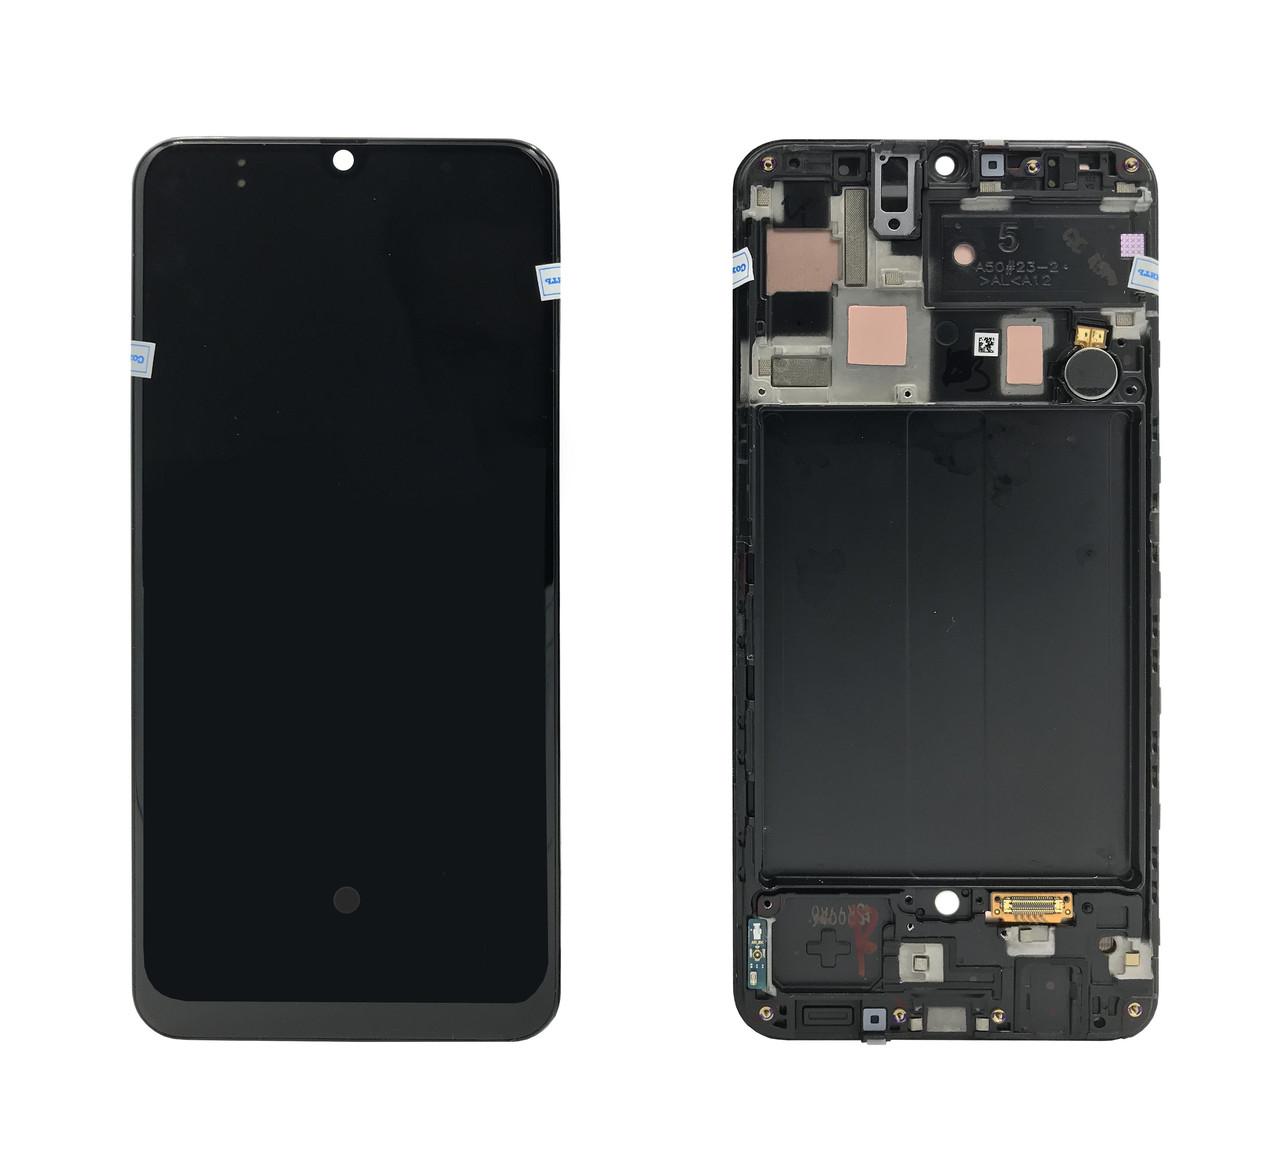 Дисплей + сенсор с передней панелью Samsung A505 Galaxy A50 (2019) Black Оригинал 100% SERVICE PACK GH82-19204A